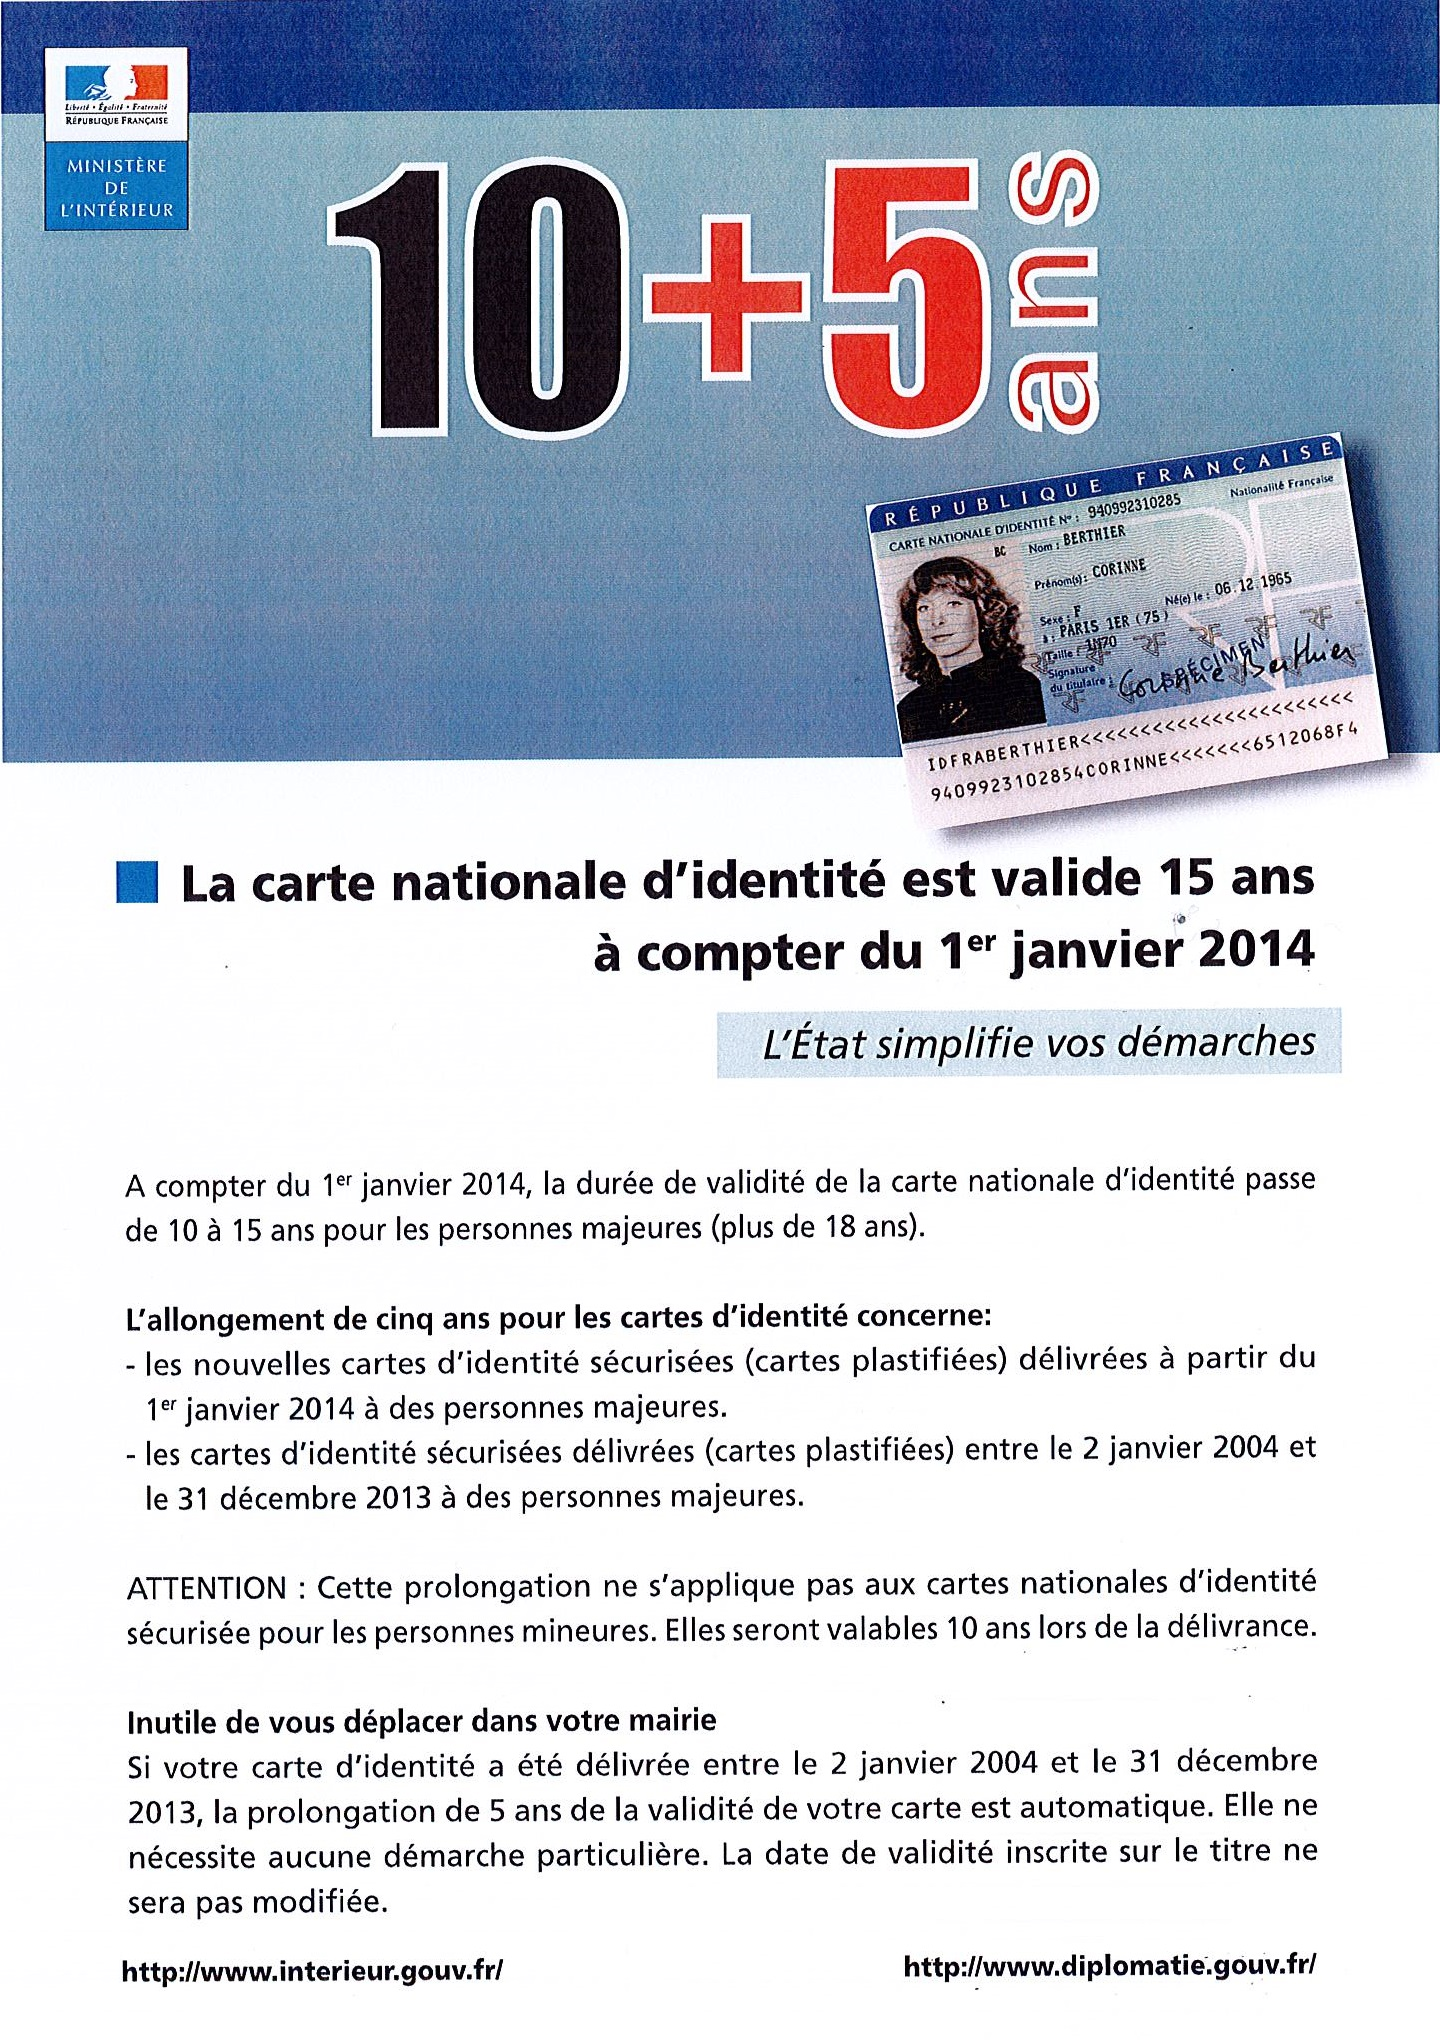 DOC020419-0001-001